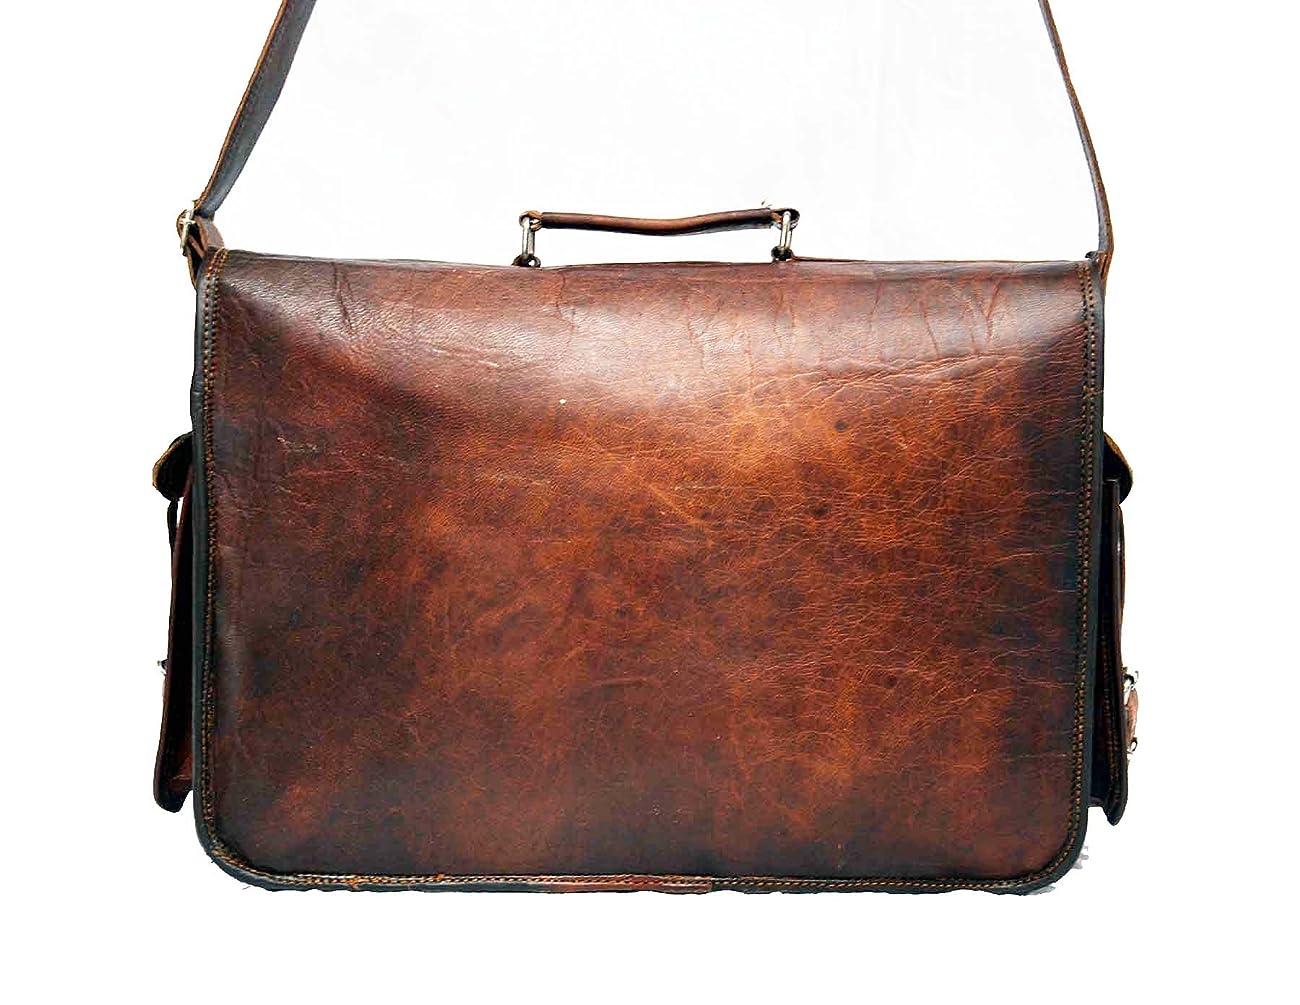 HIDE 1858 TM Genuine Leather Camera Office Satchel Bag 15